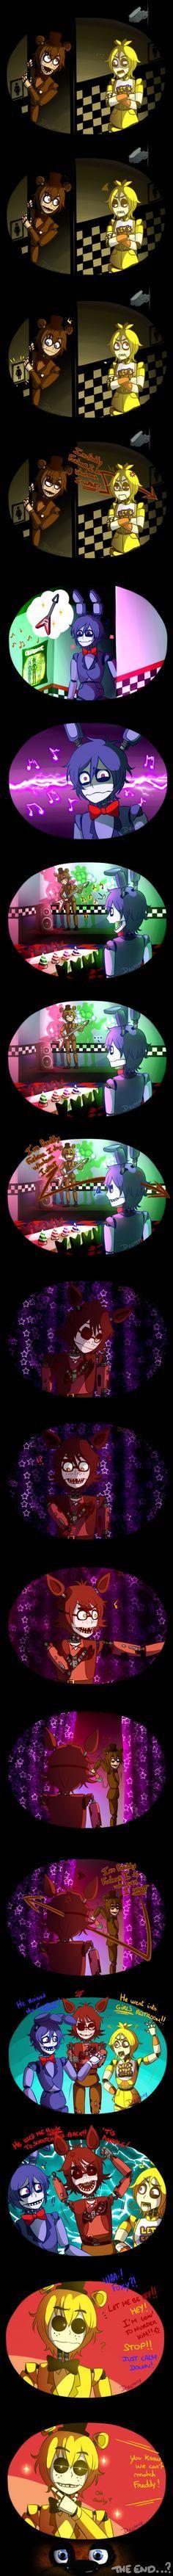 [FNAF] What if they meet each other? by YumeChii-NI on DeviantArt Five Nights At Freddy's, Fnaf 4, Anime Fnaf, Freddy S, Fnaf Sister Location, Fnaf Drawings, Freddy Fazbear, Bendy And The Ink Machine, Kawaii